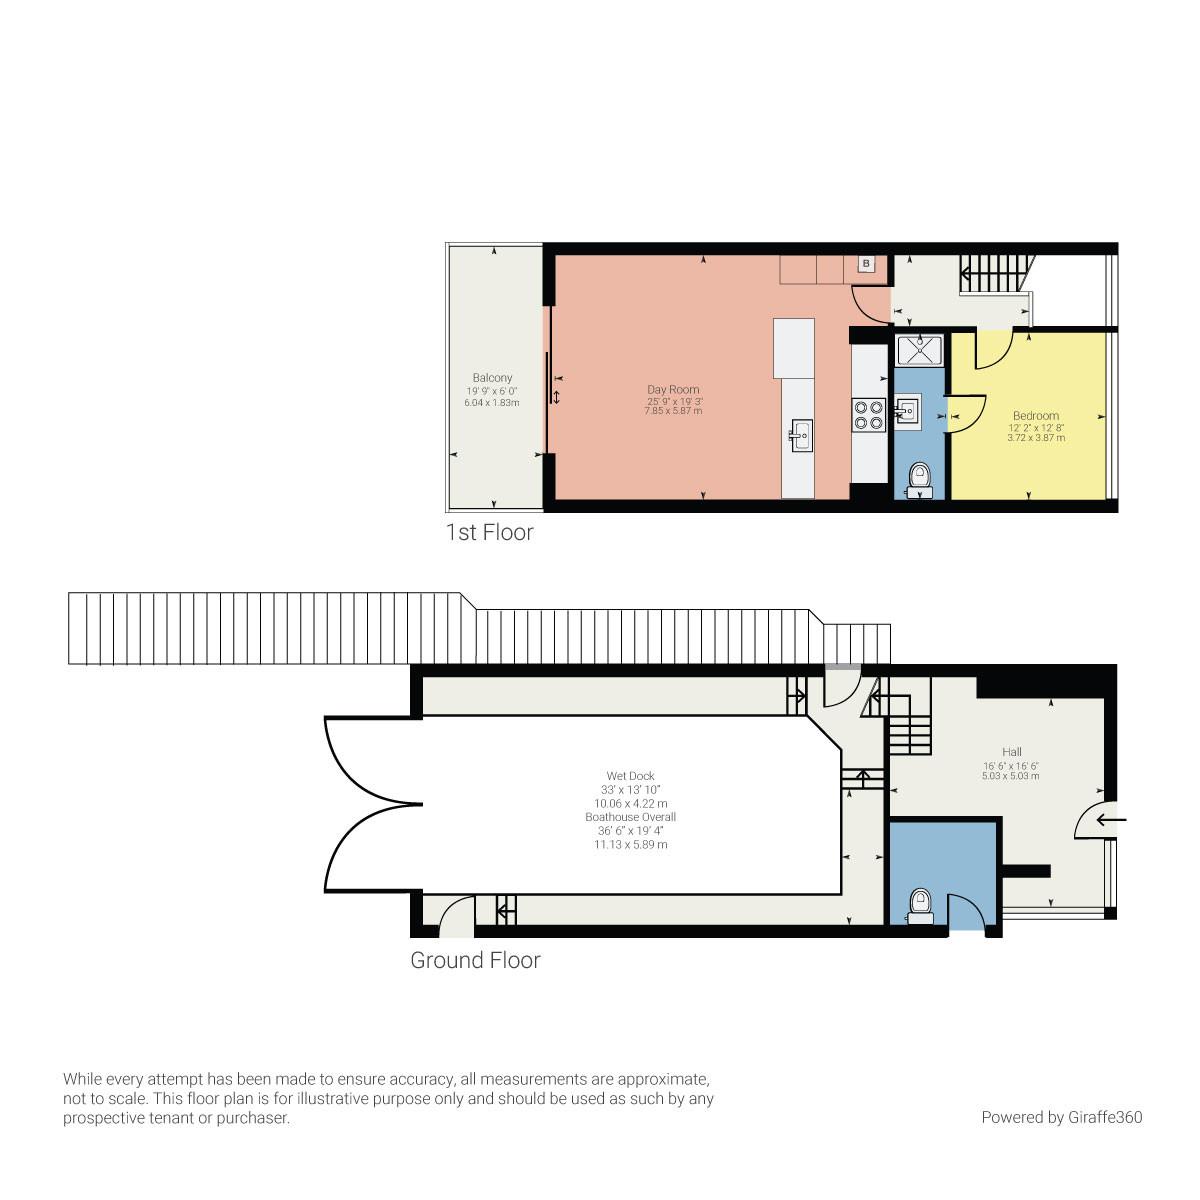 Floorplan Lake View, Storrs Park, Bowness on Windermere, Cumbria, LA23 3LH